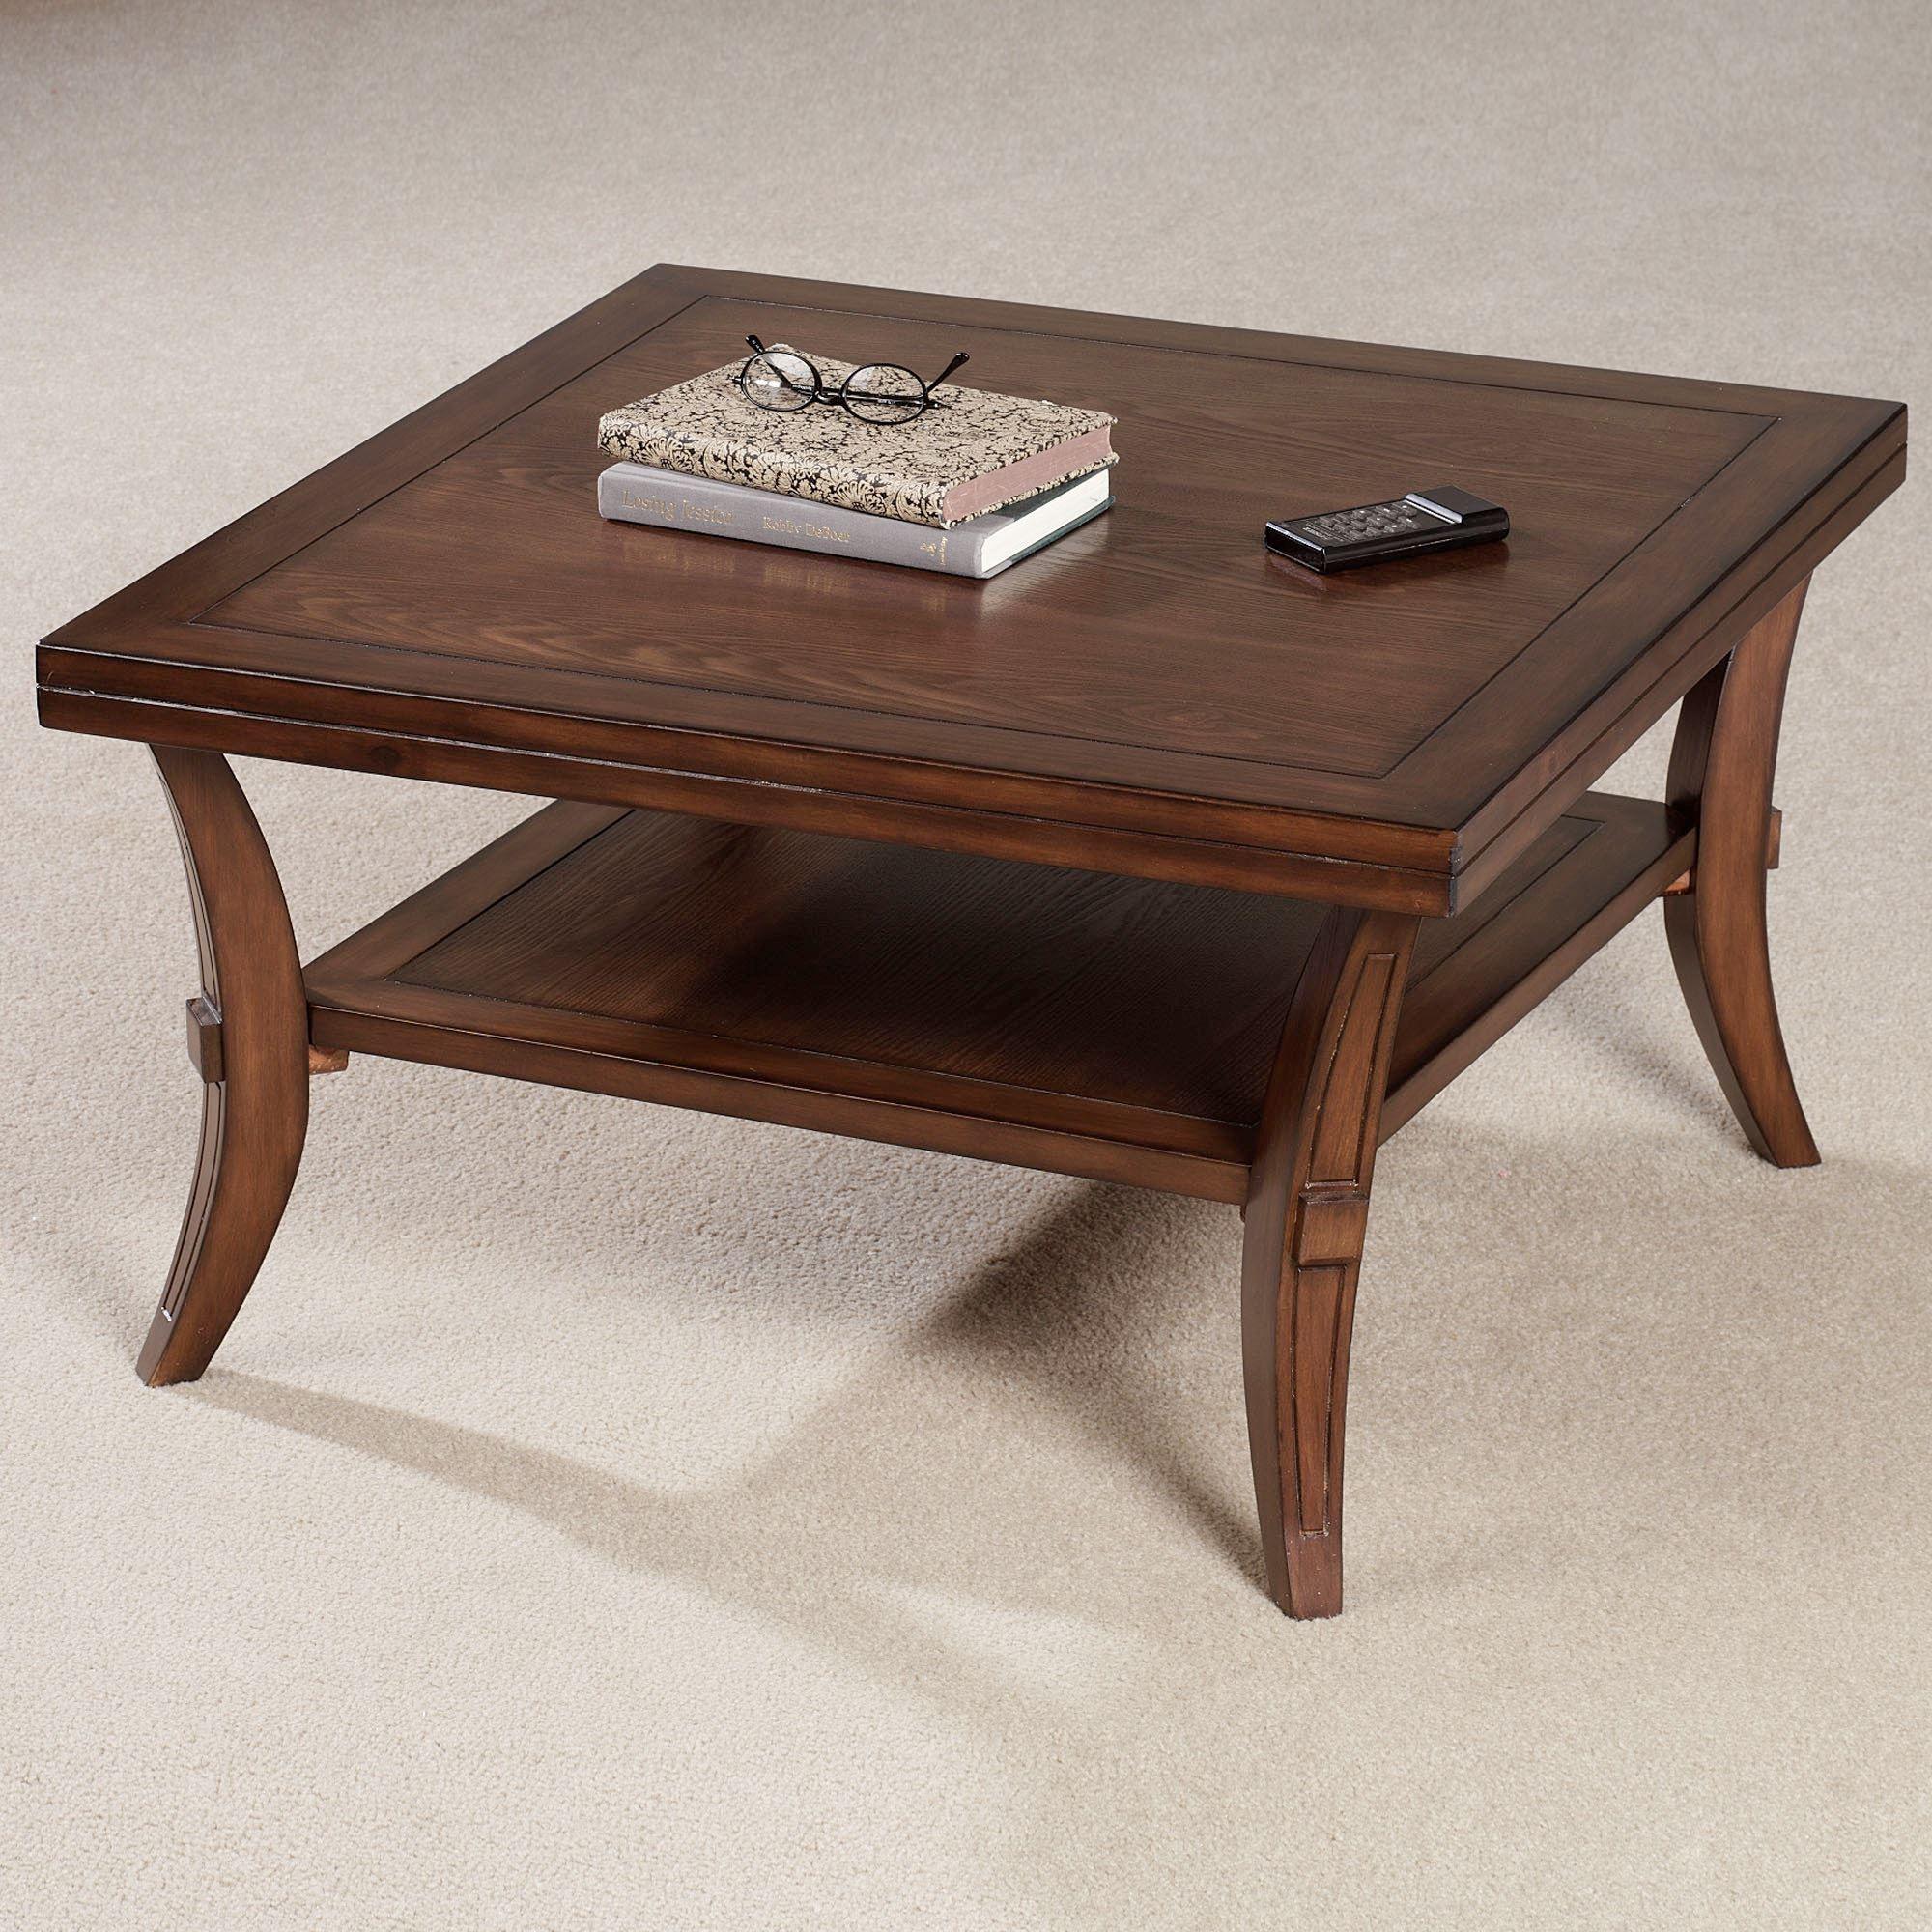 Art Van Coffee Table Sets: Hancock Square Coffee Table